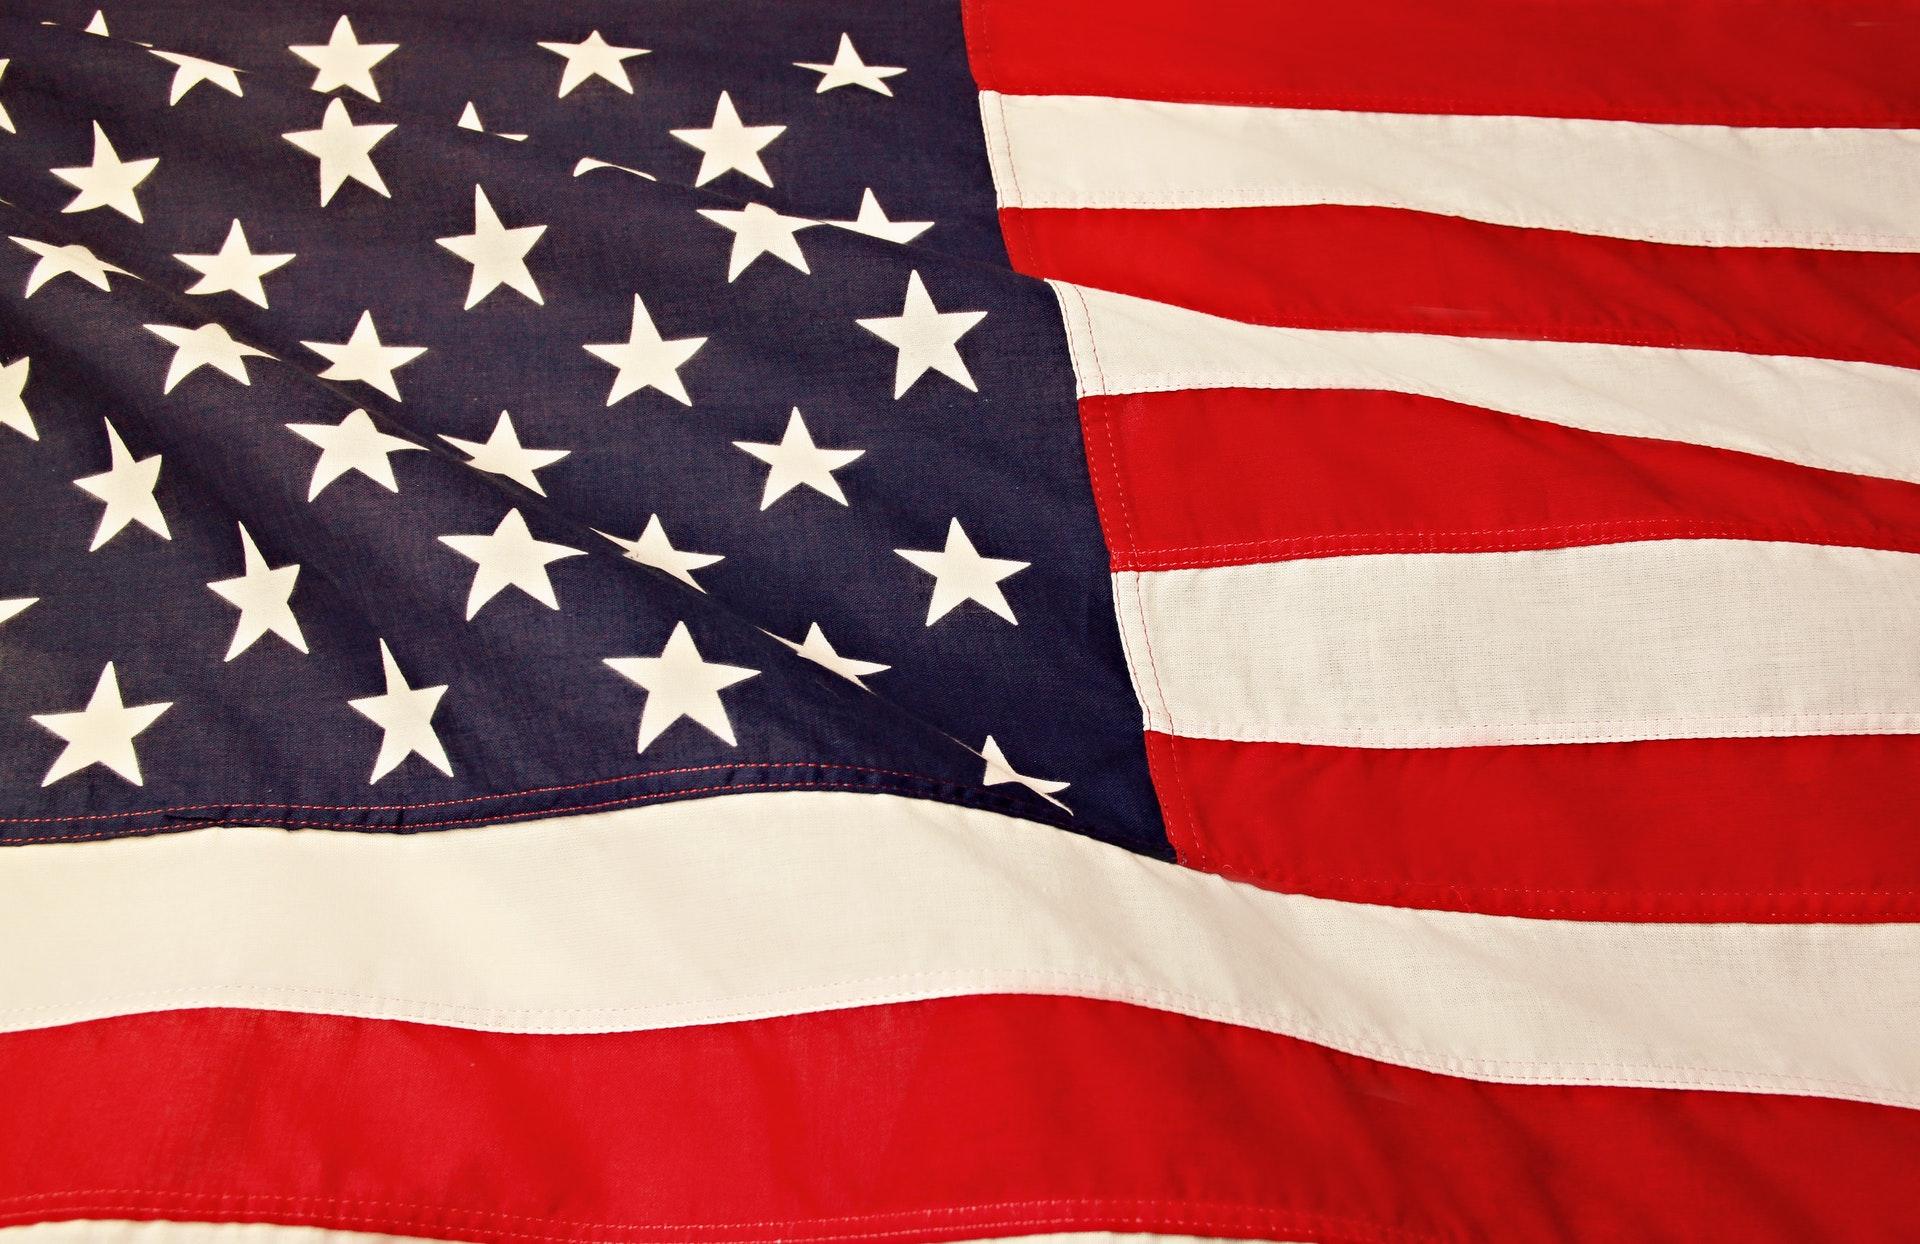 American Flag Decorative Image